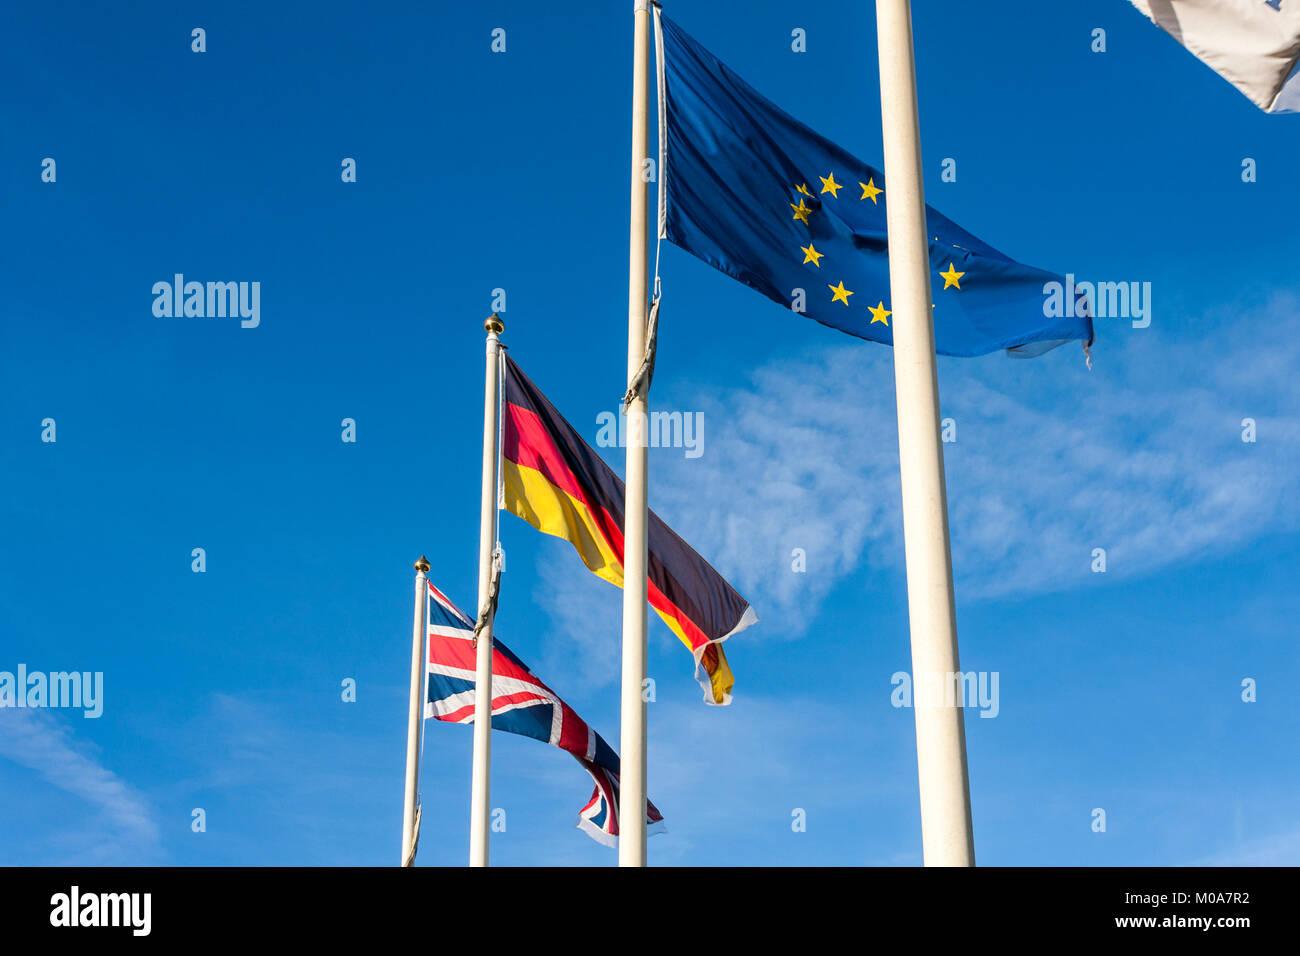 Tolle Chinesische Flagge Färbung Seite Fotos - Entry Level Resume ...